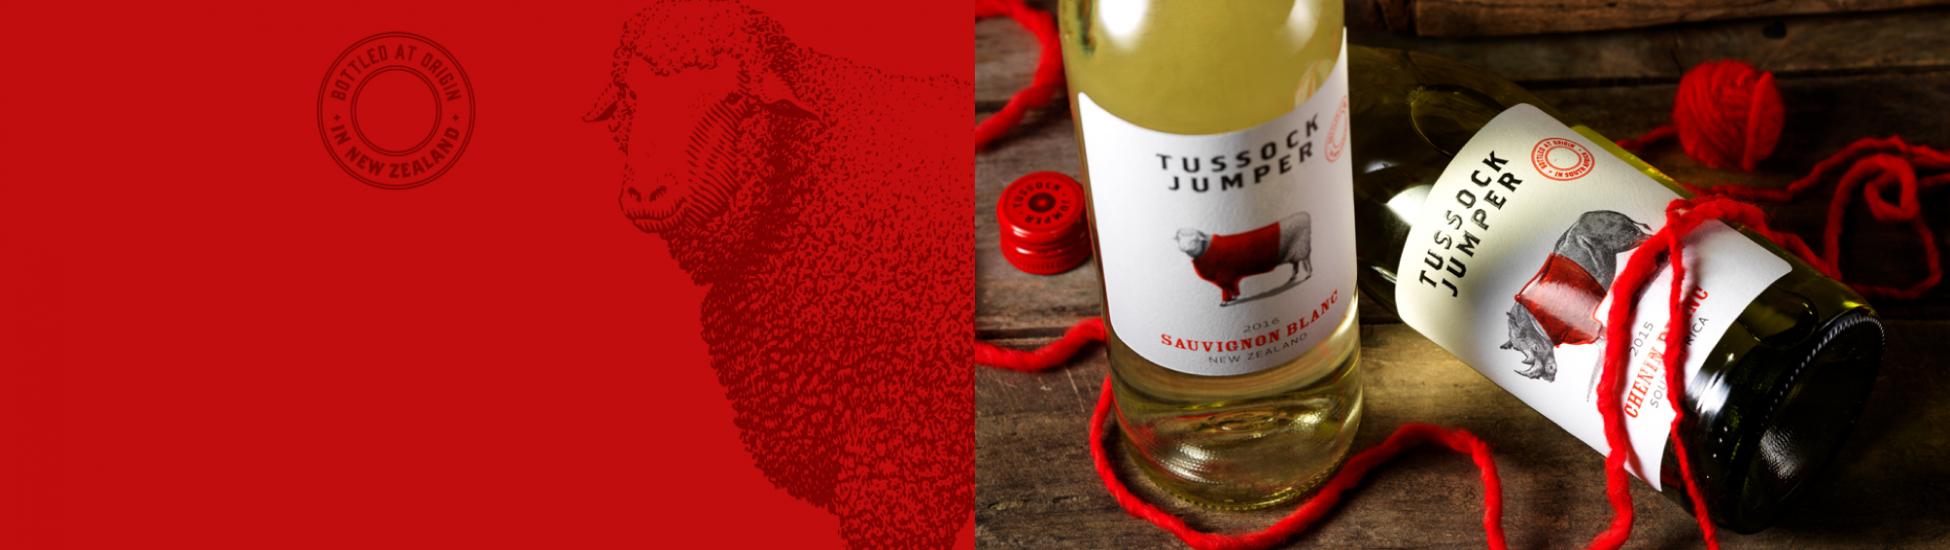 Tussock Jumper Wines - New Zealand - Sauvignon Blanc